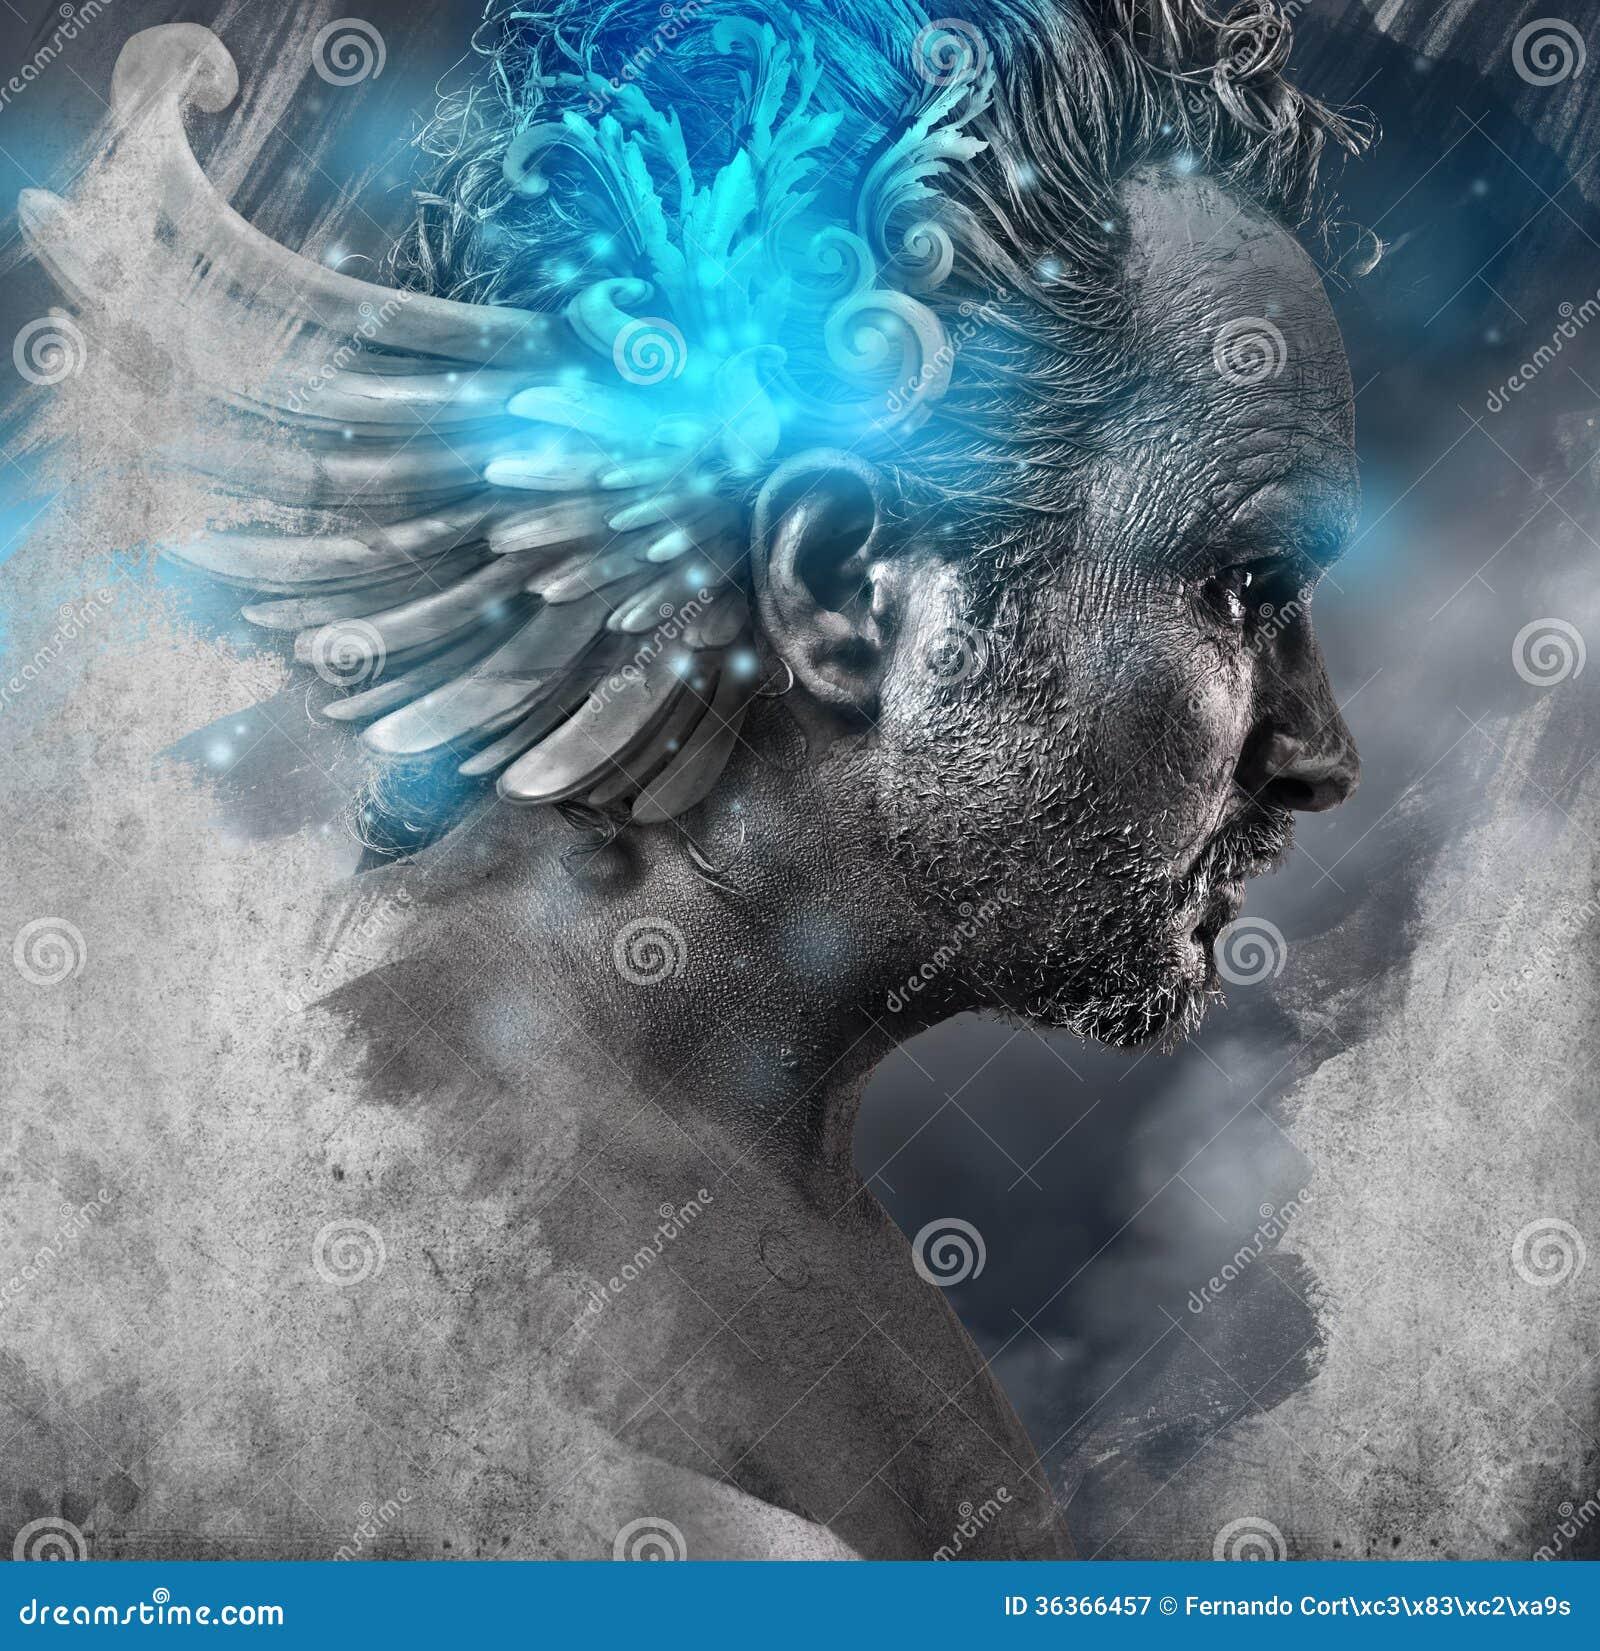 Heroe mythology man with black shapes studio portrait stock image image of concepts - Free evil angel pictures ...